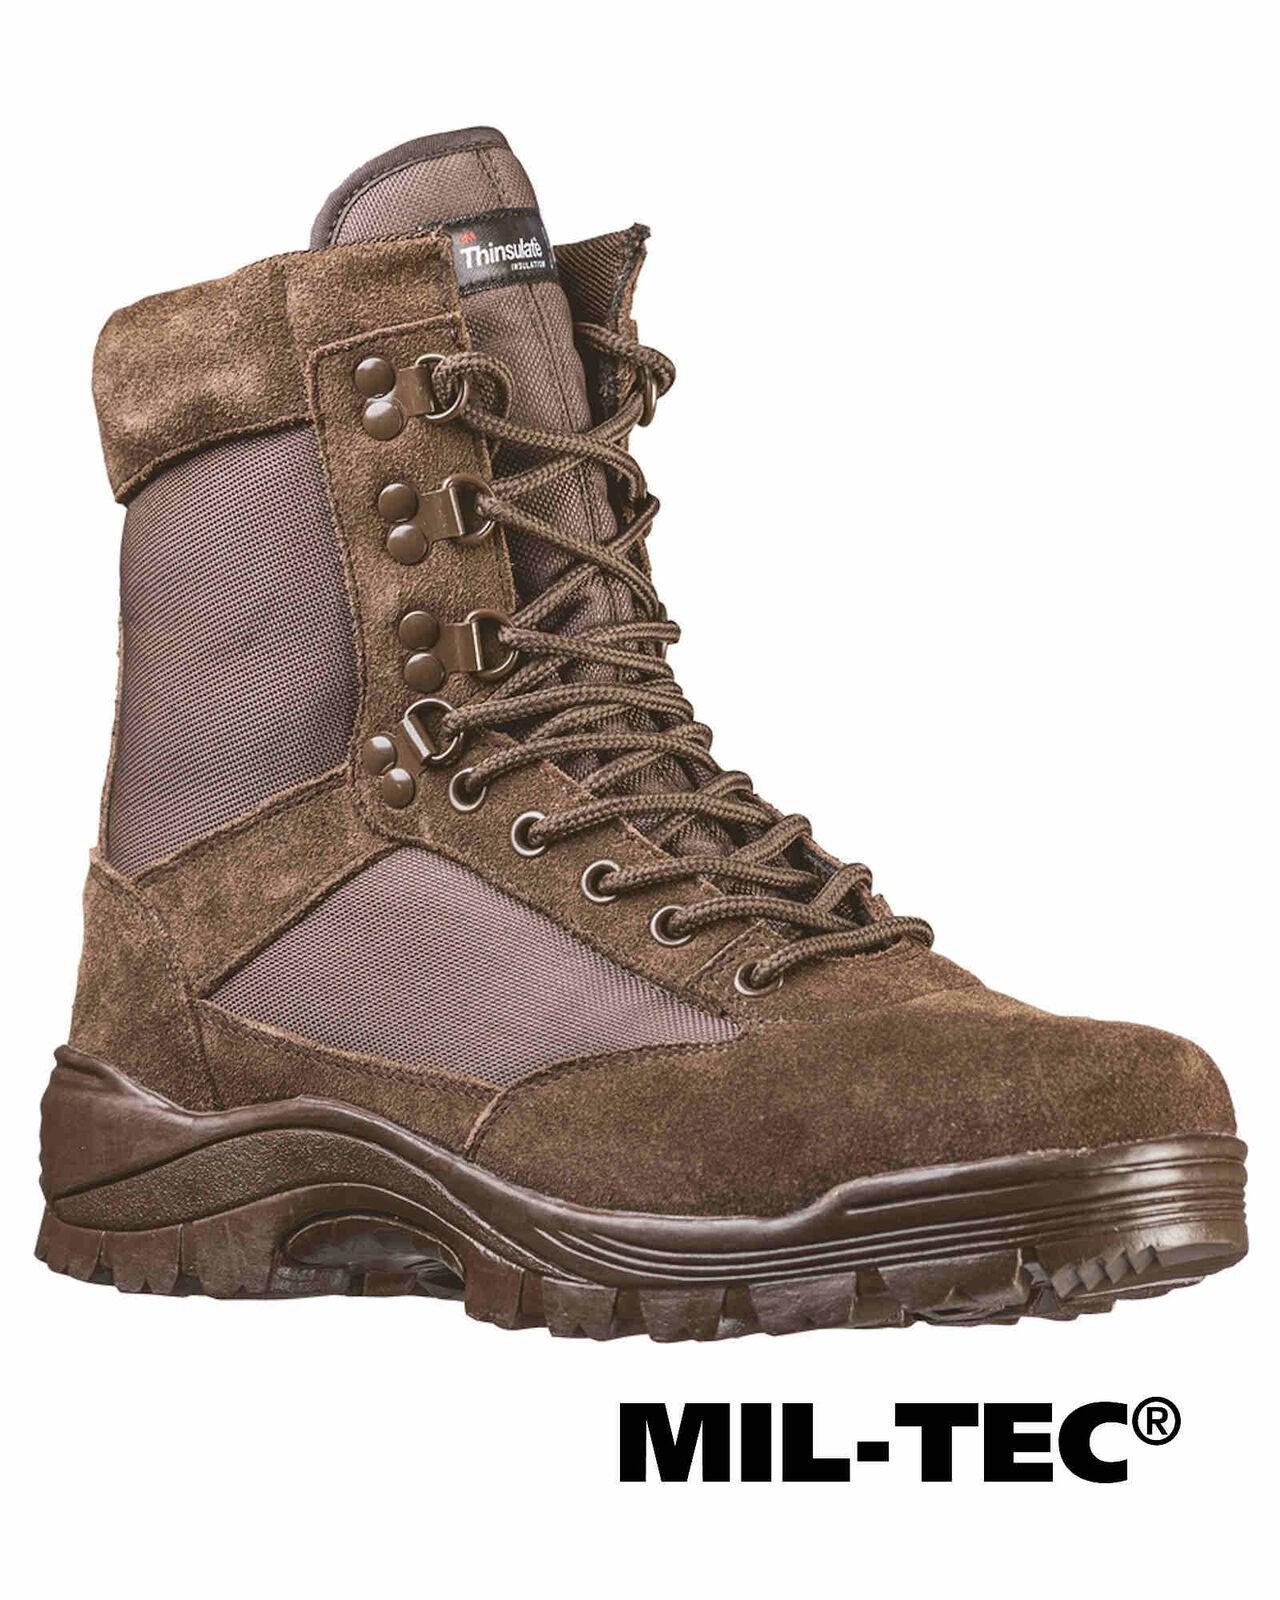 Mil-tec Tactical barco m. ykk Zipper marrón botas zapatos